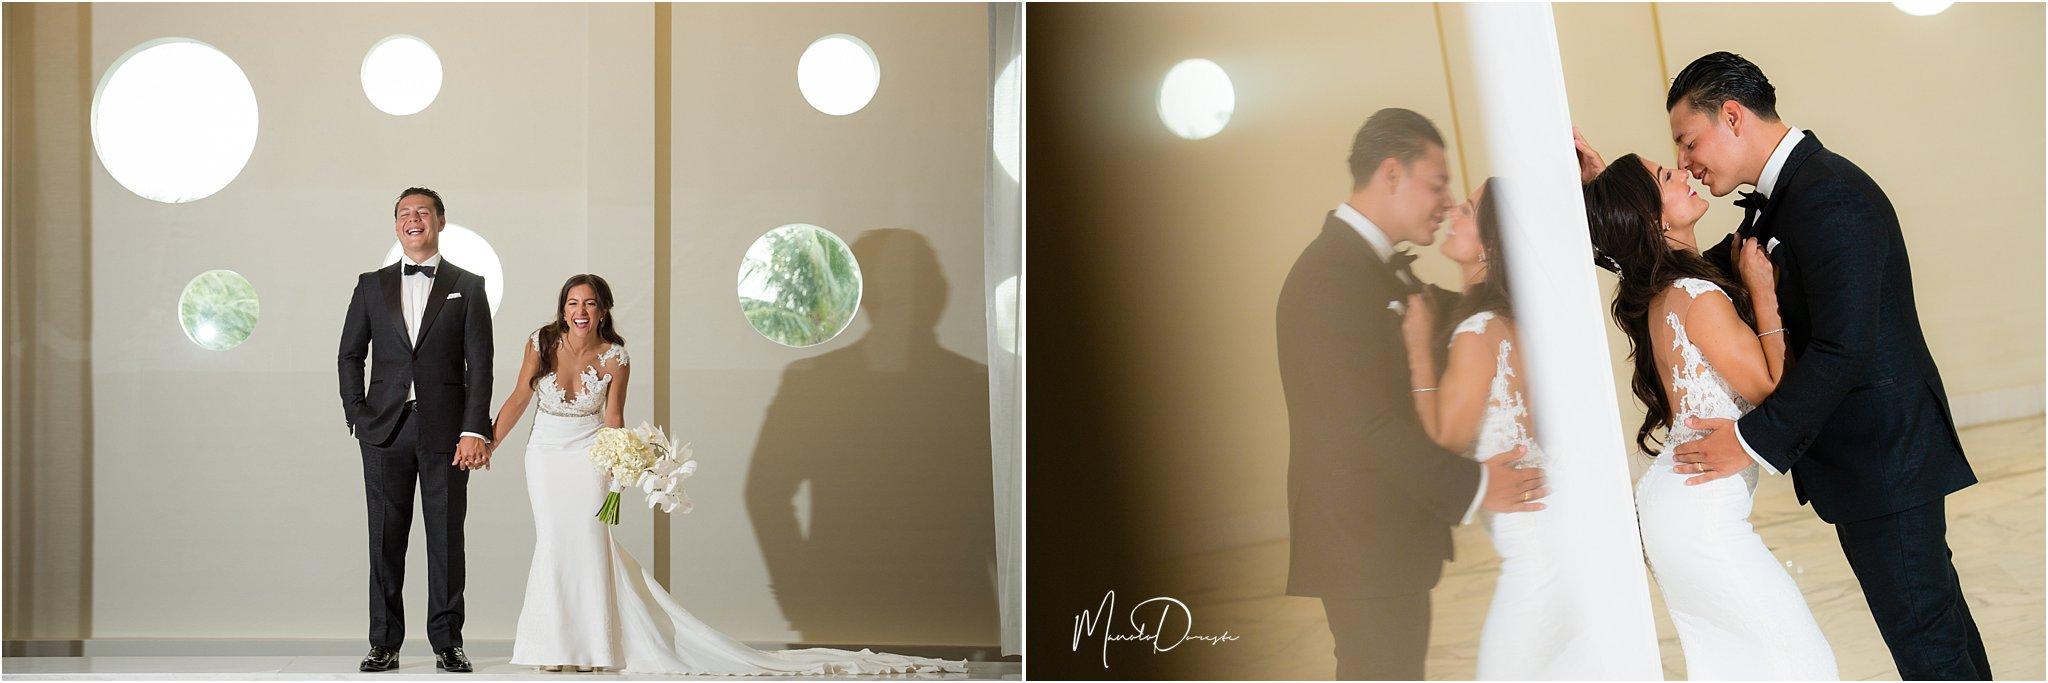 0325_ManoloDoreste_InFocusStudios_Wedding_Family_Photography_Miami_MiamiPhotographer.jpg